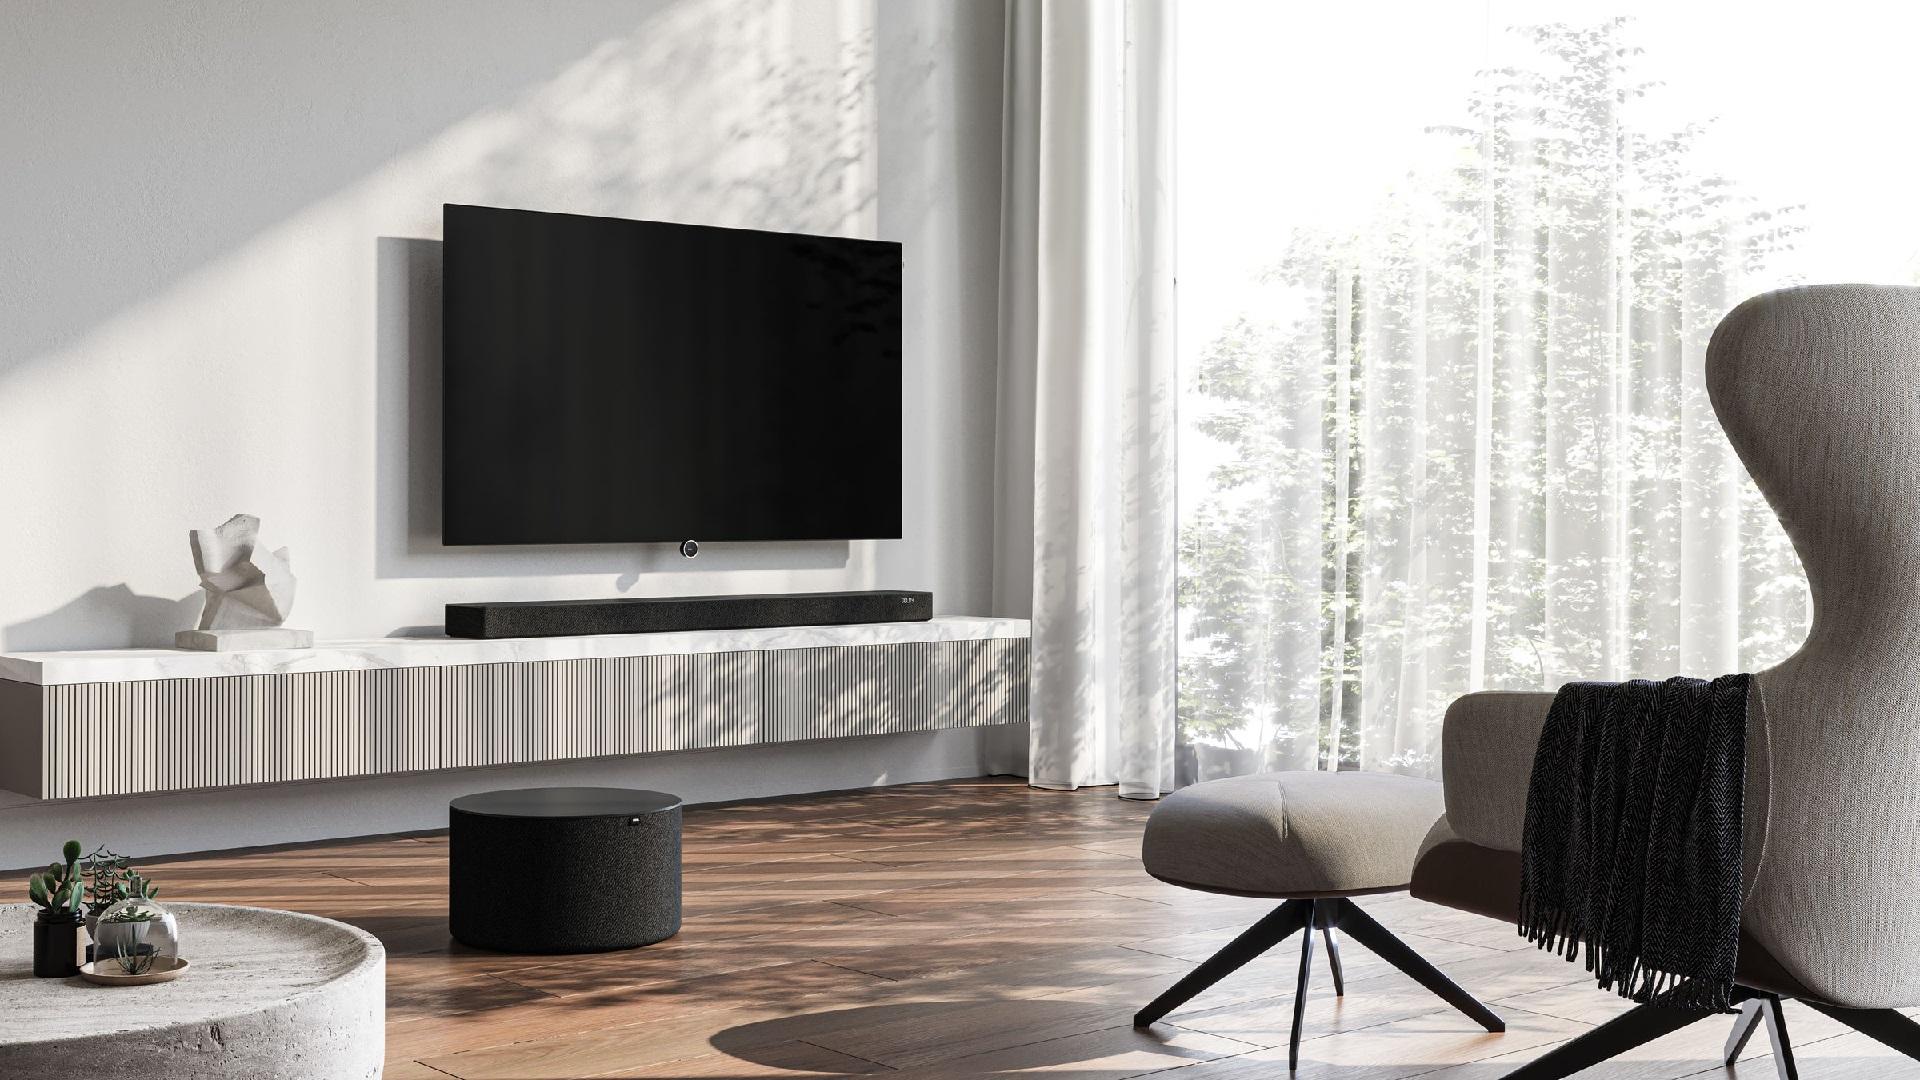 Loewe bild i OLED TV klang bar 5 klan sub 5